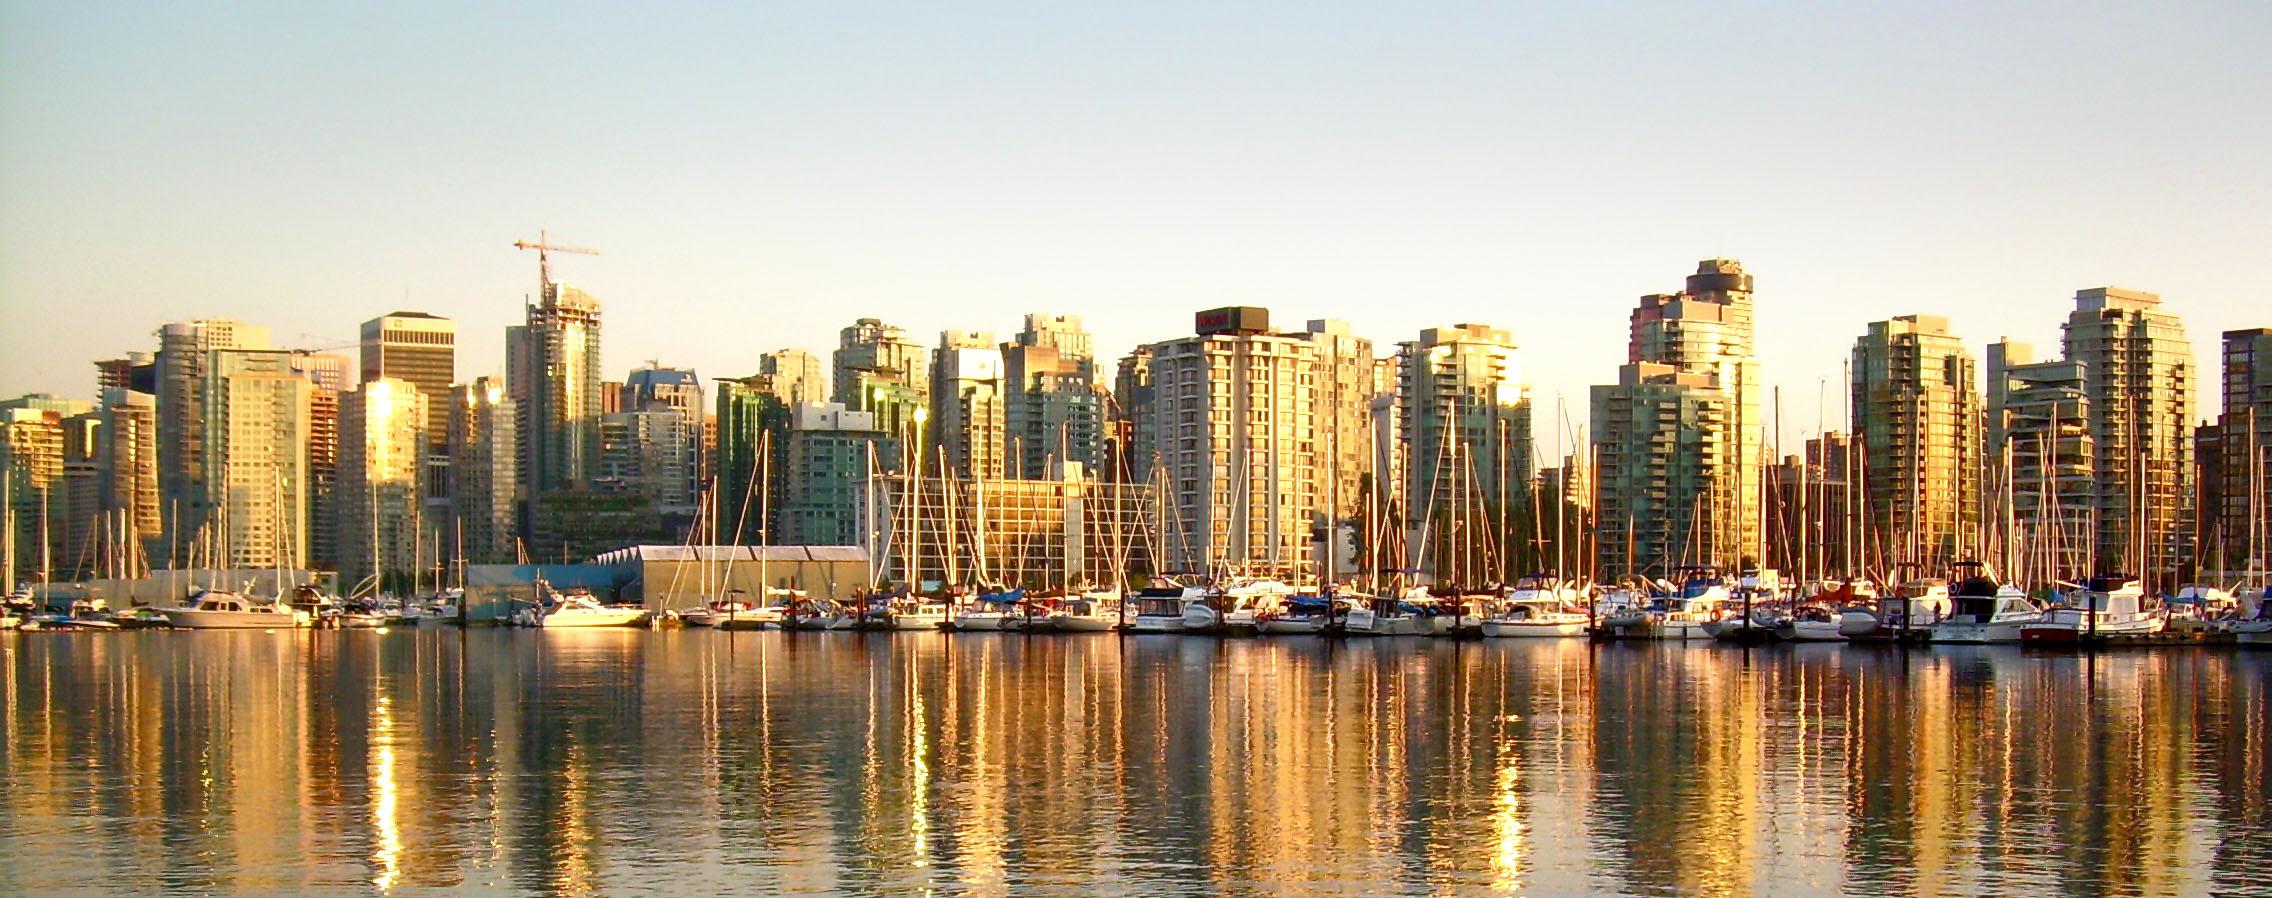 vancouver-harbor-1386864b.jpg